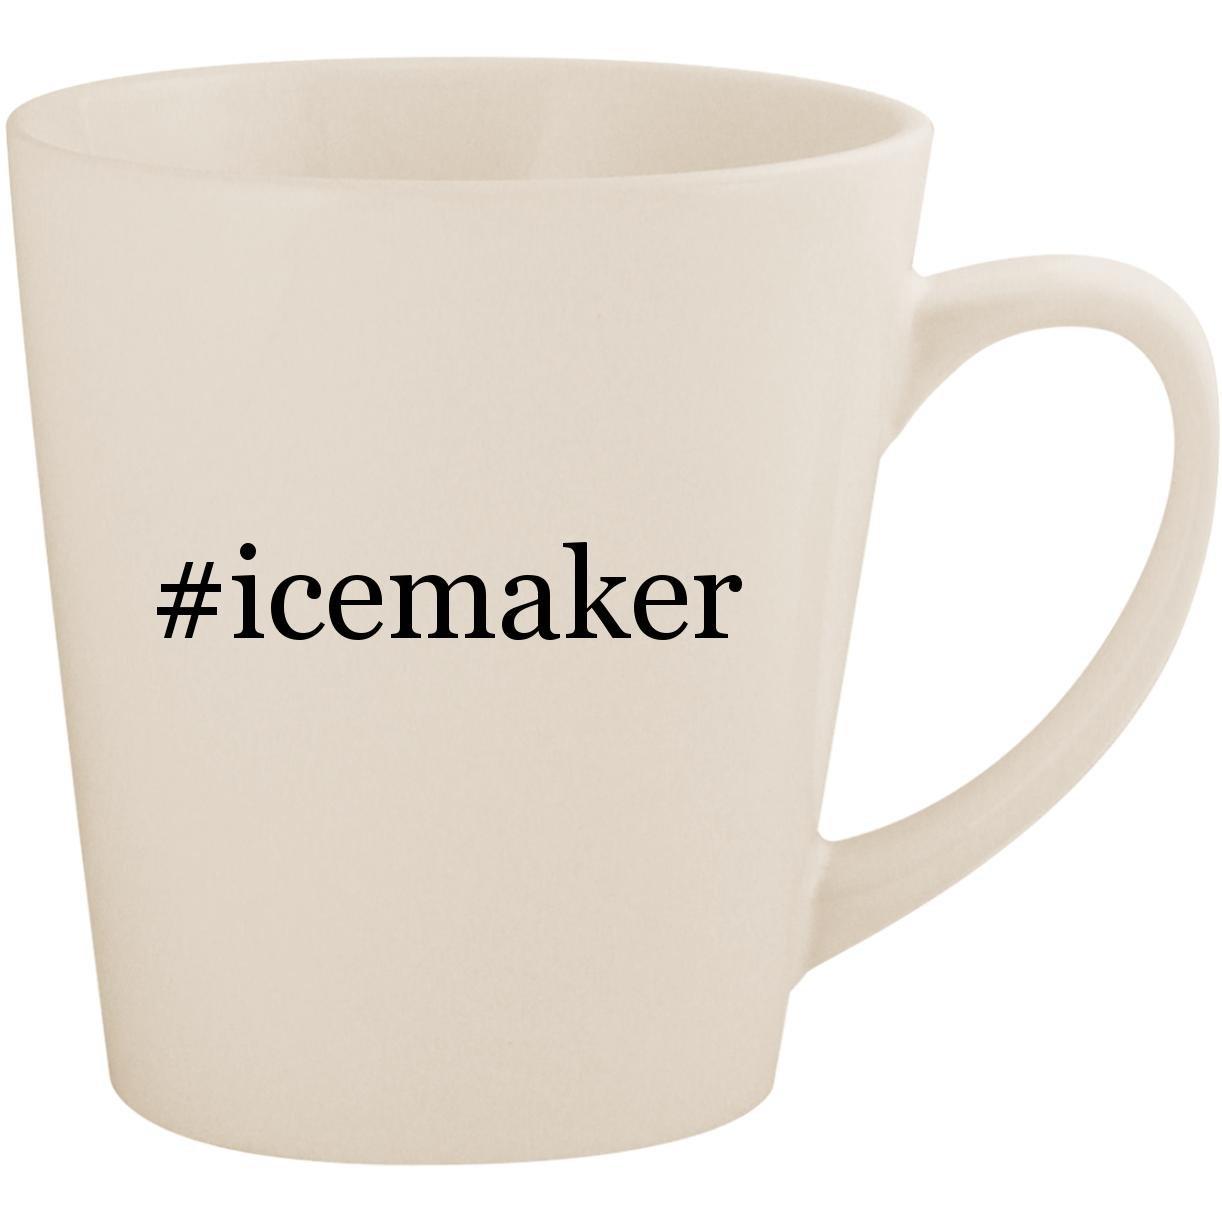 #icemaker - White Hashtag 12oz Ceramic Latte Mug Cup